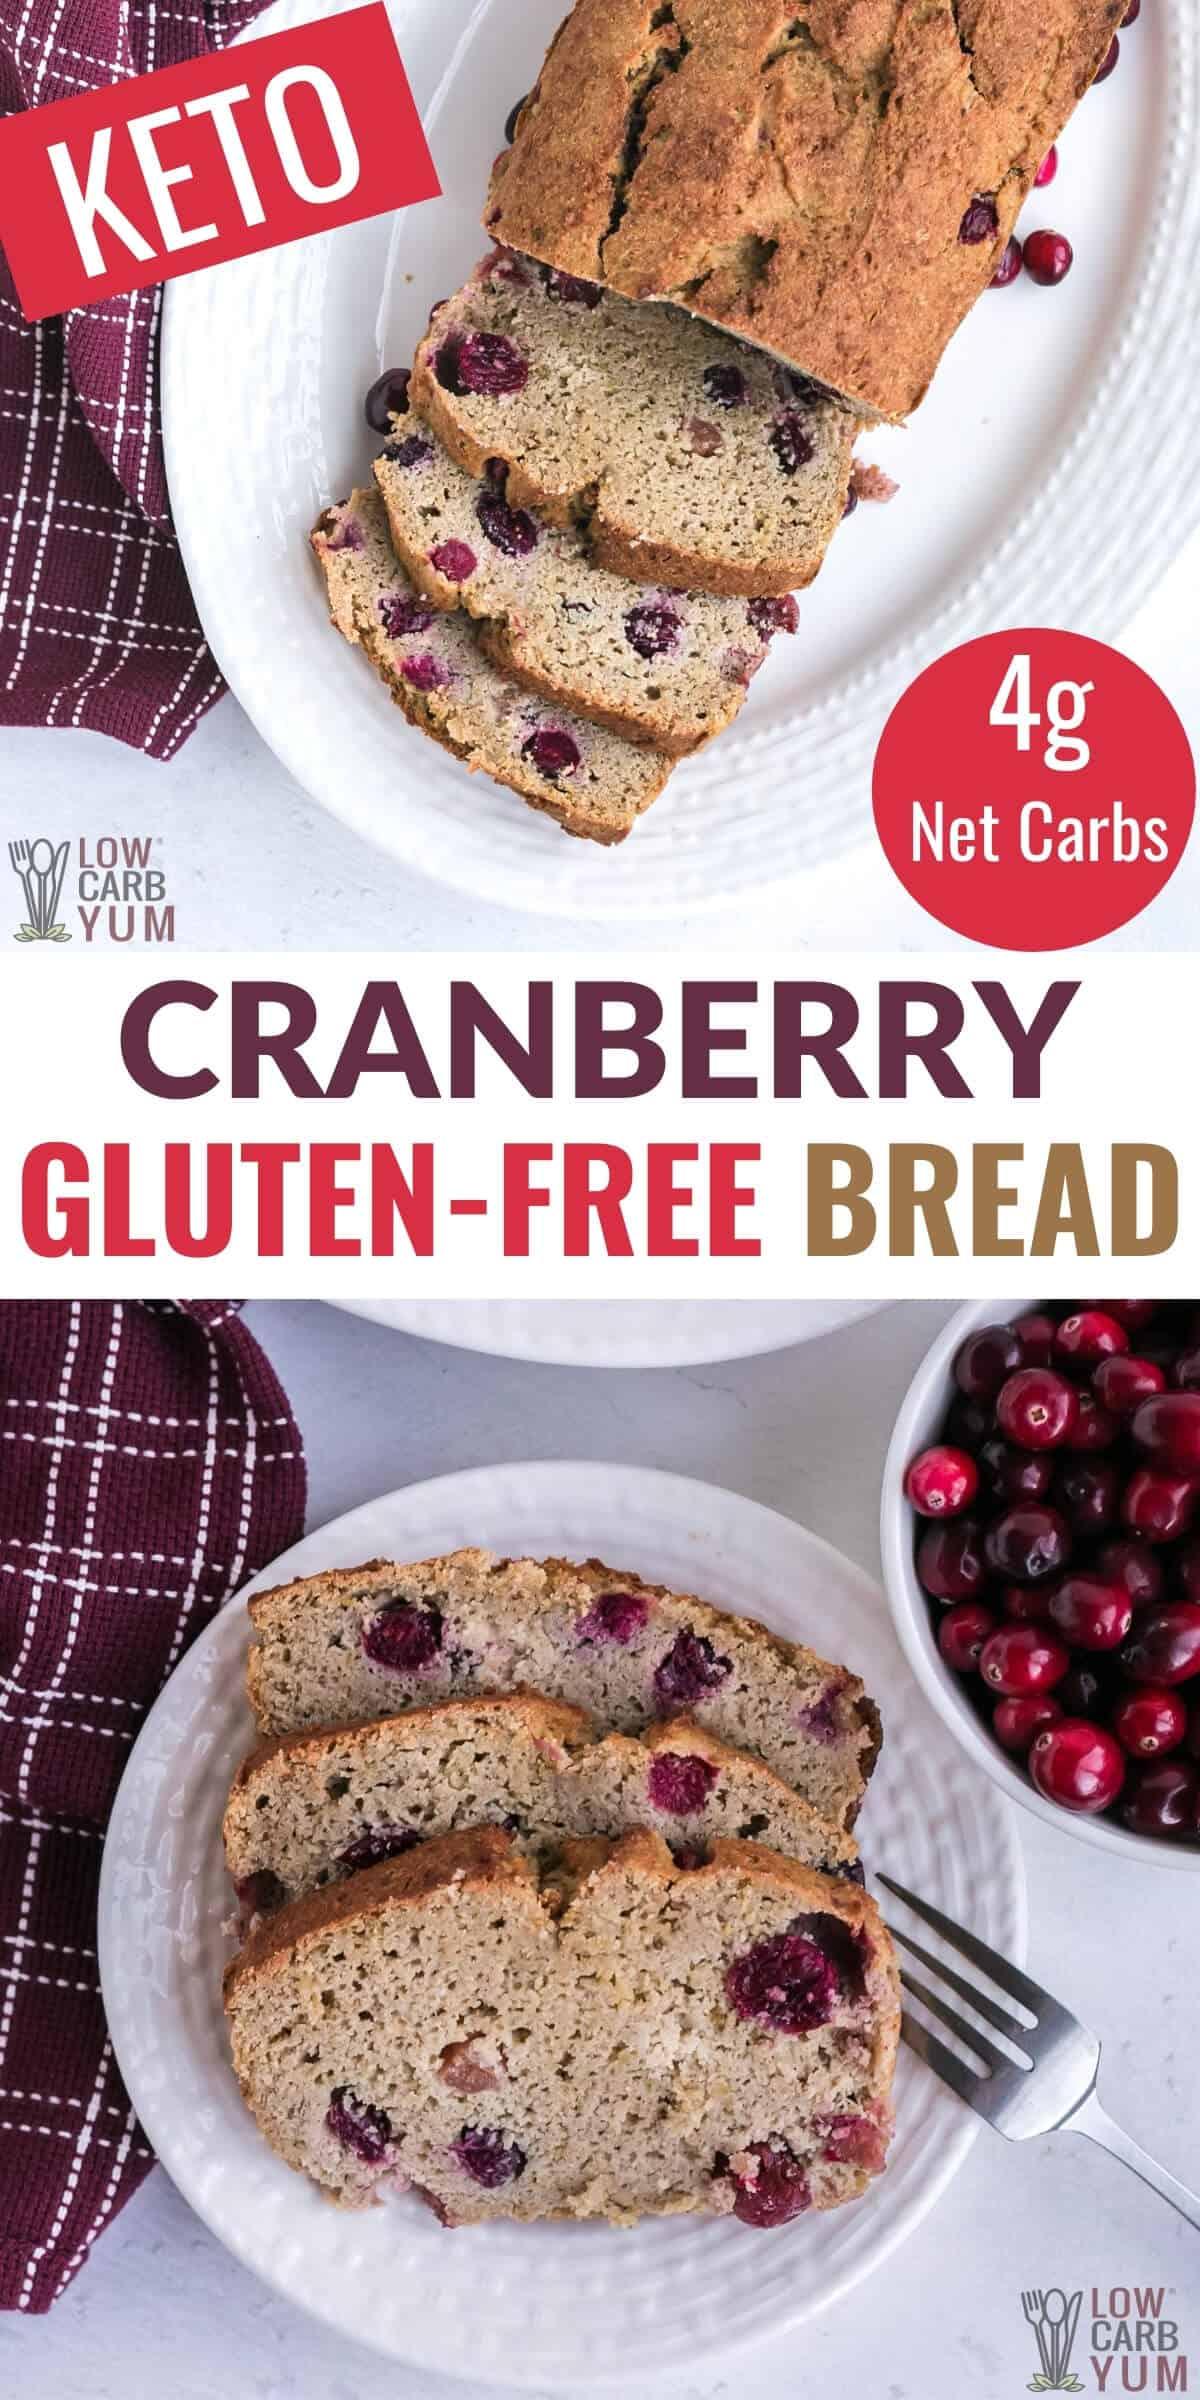 keto cranberry gluten-free bread pinterest image